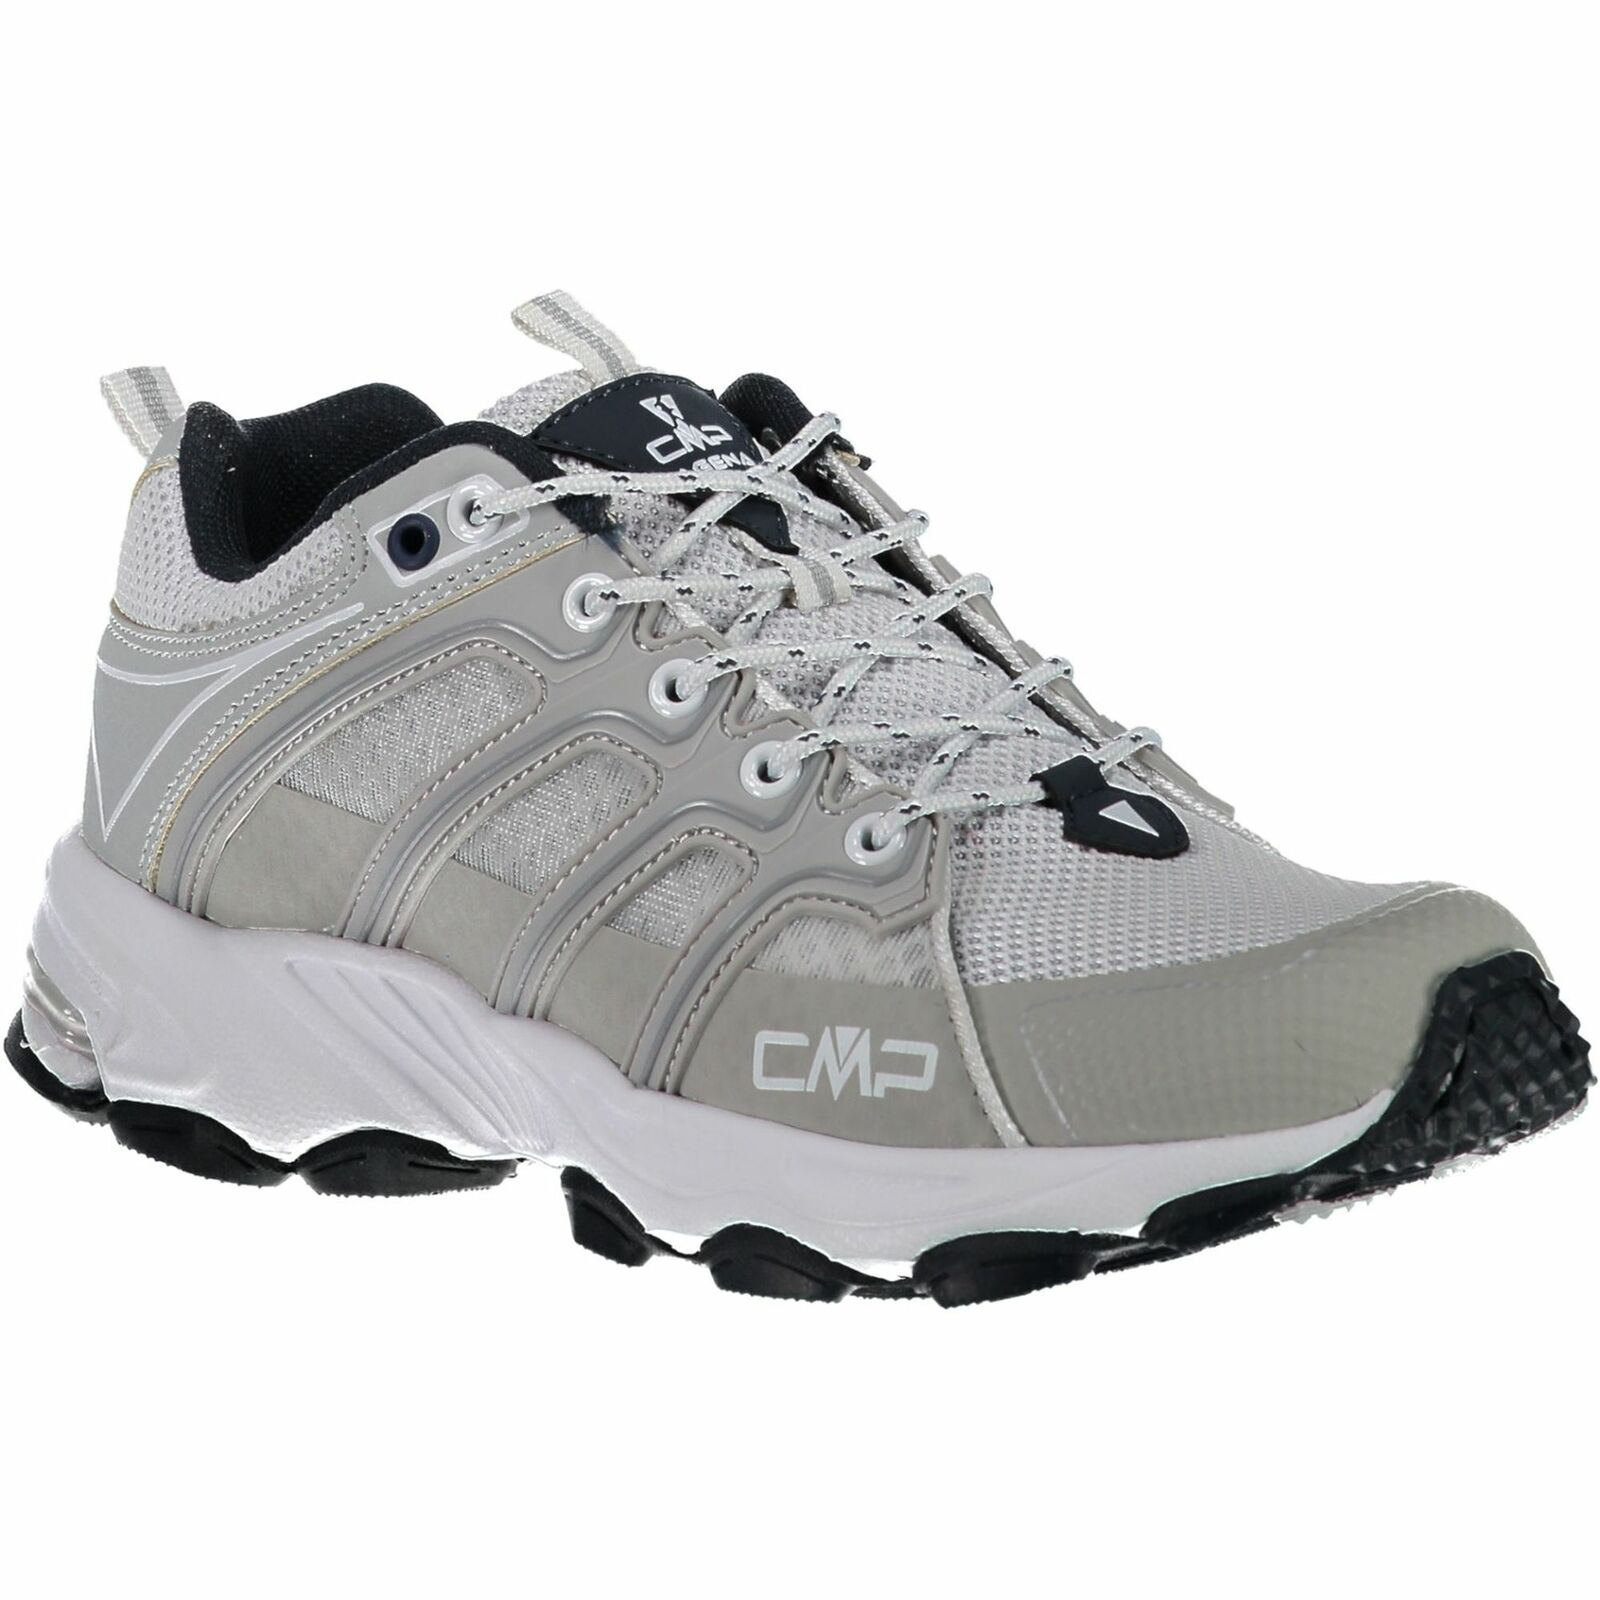 CMP shoes agena wmn trail shoe grey lightweight plain  mesh  amazing colorways